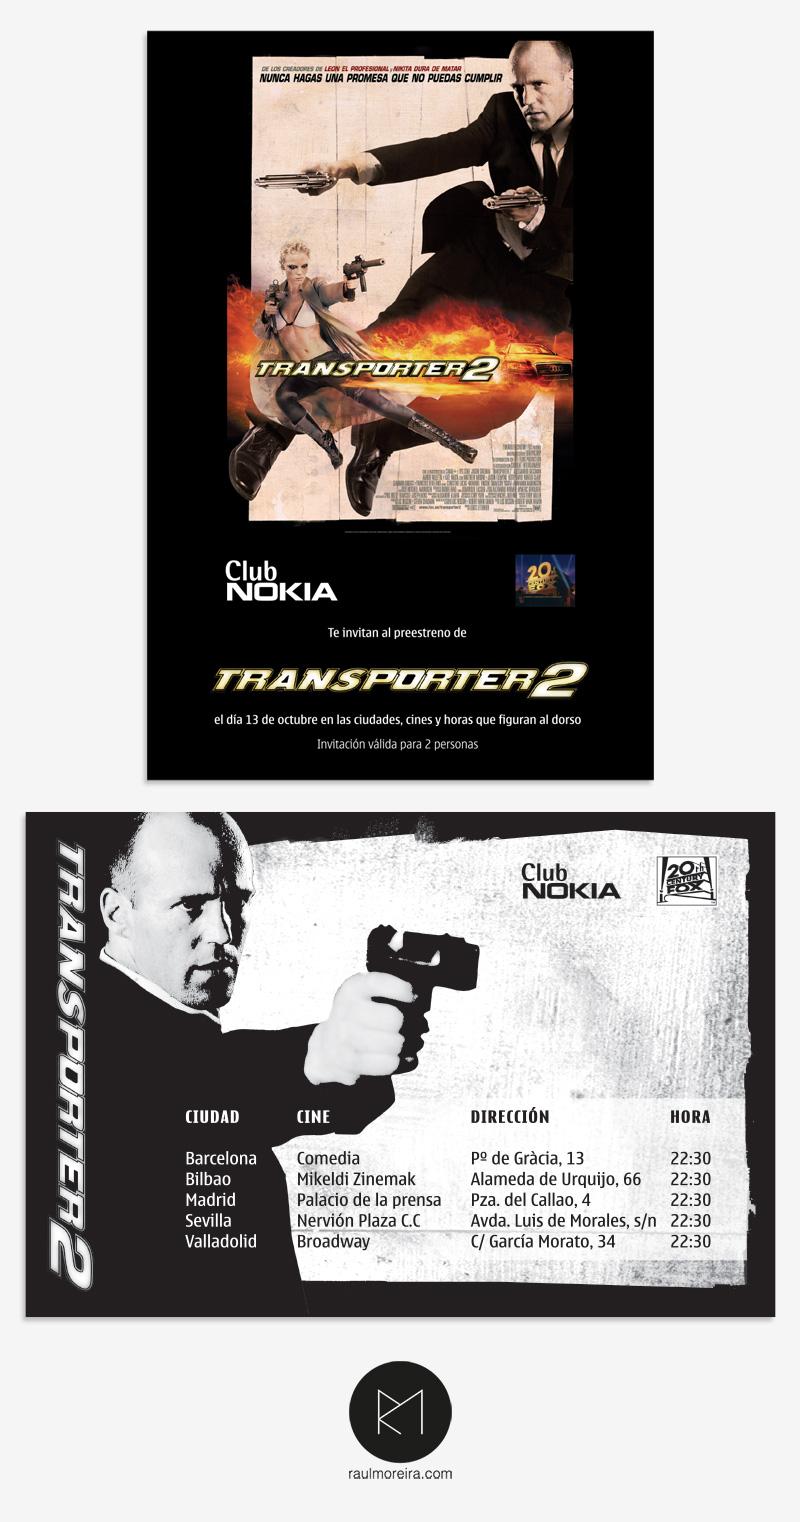 Transporter - pre estreno